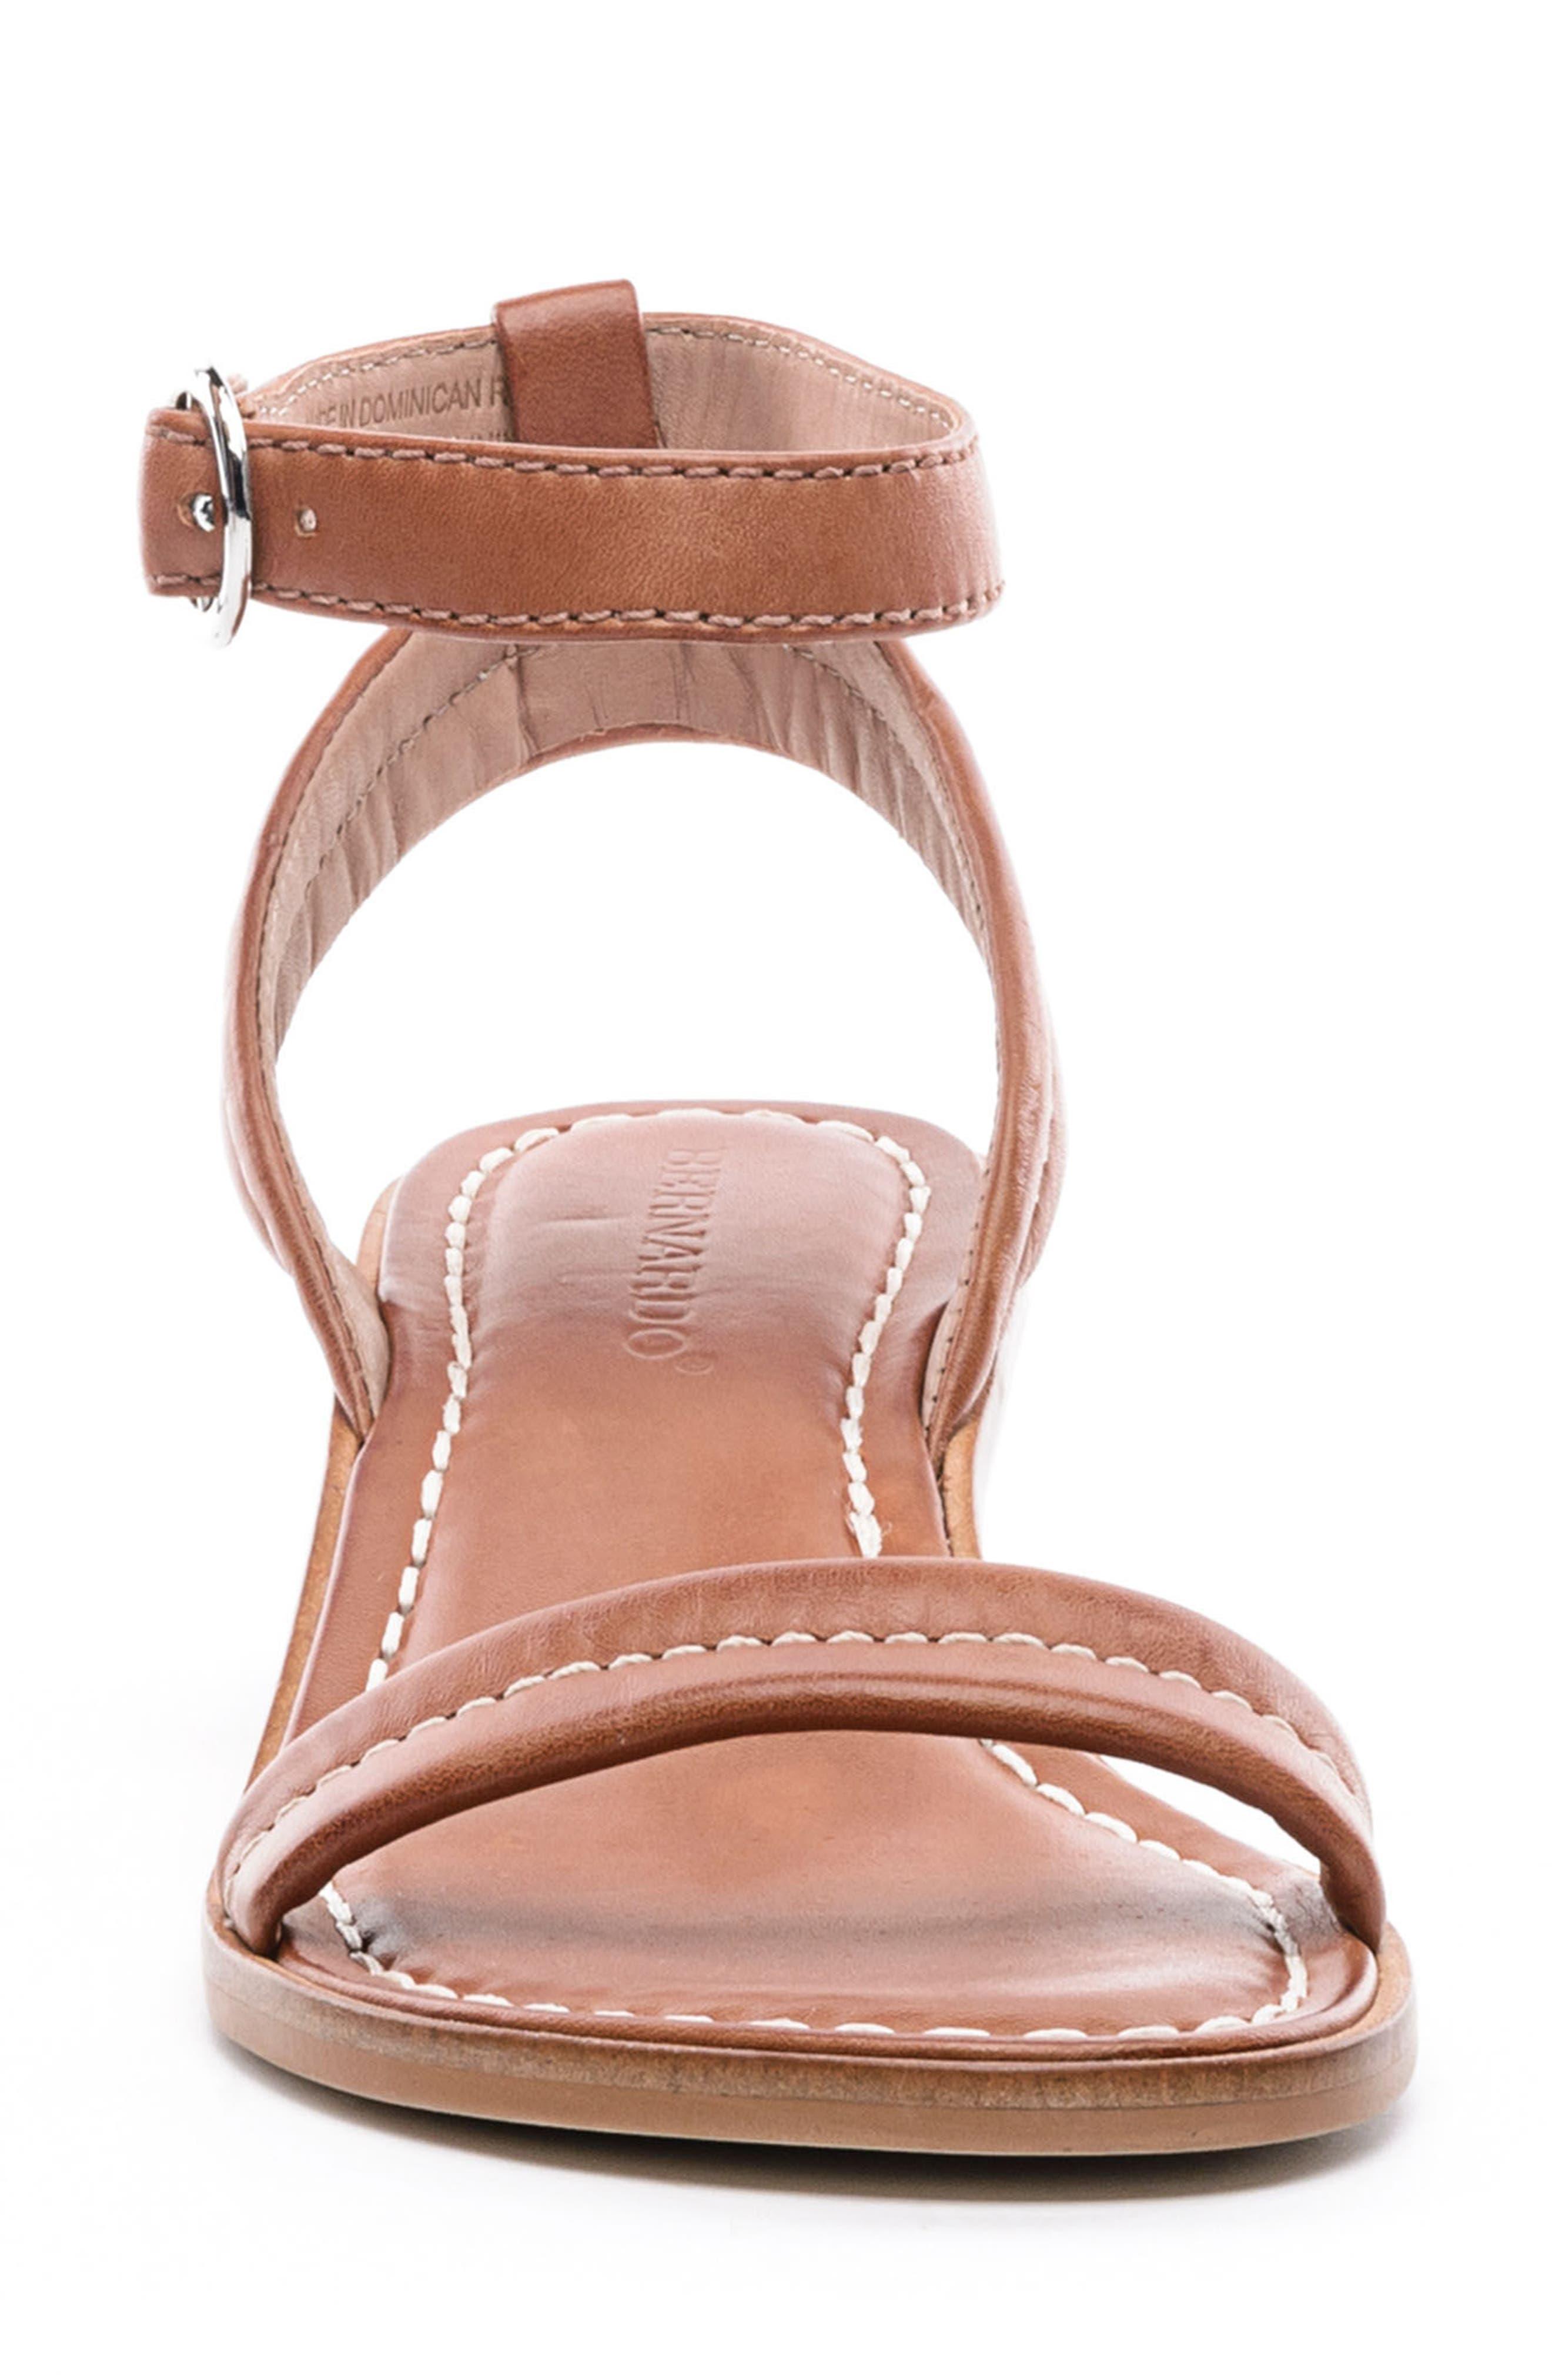 BERNARDO, Catherine Ankle Strap Sandal, Alternate thumbnail 4, color, LUGGAGE BROWN ANTIQUE